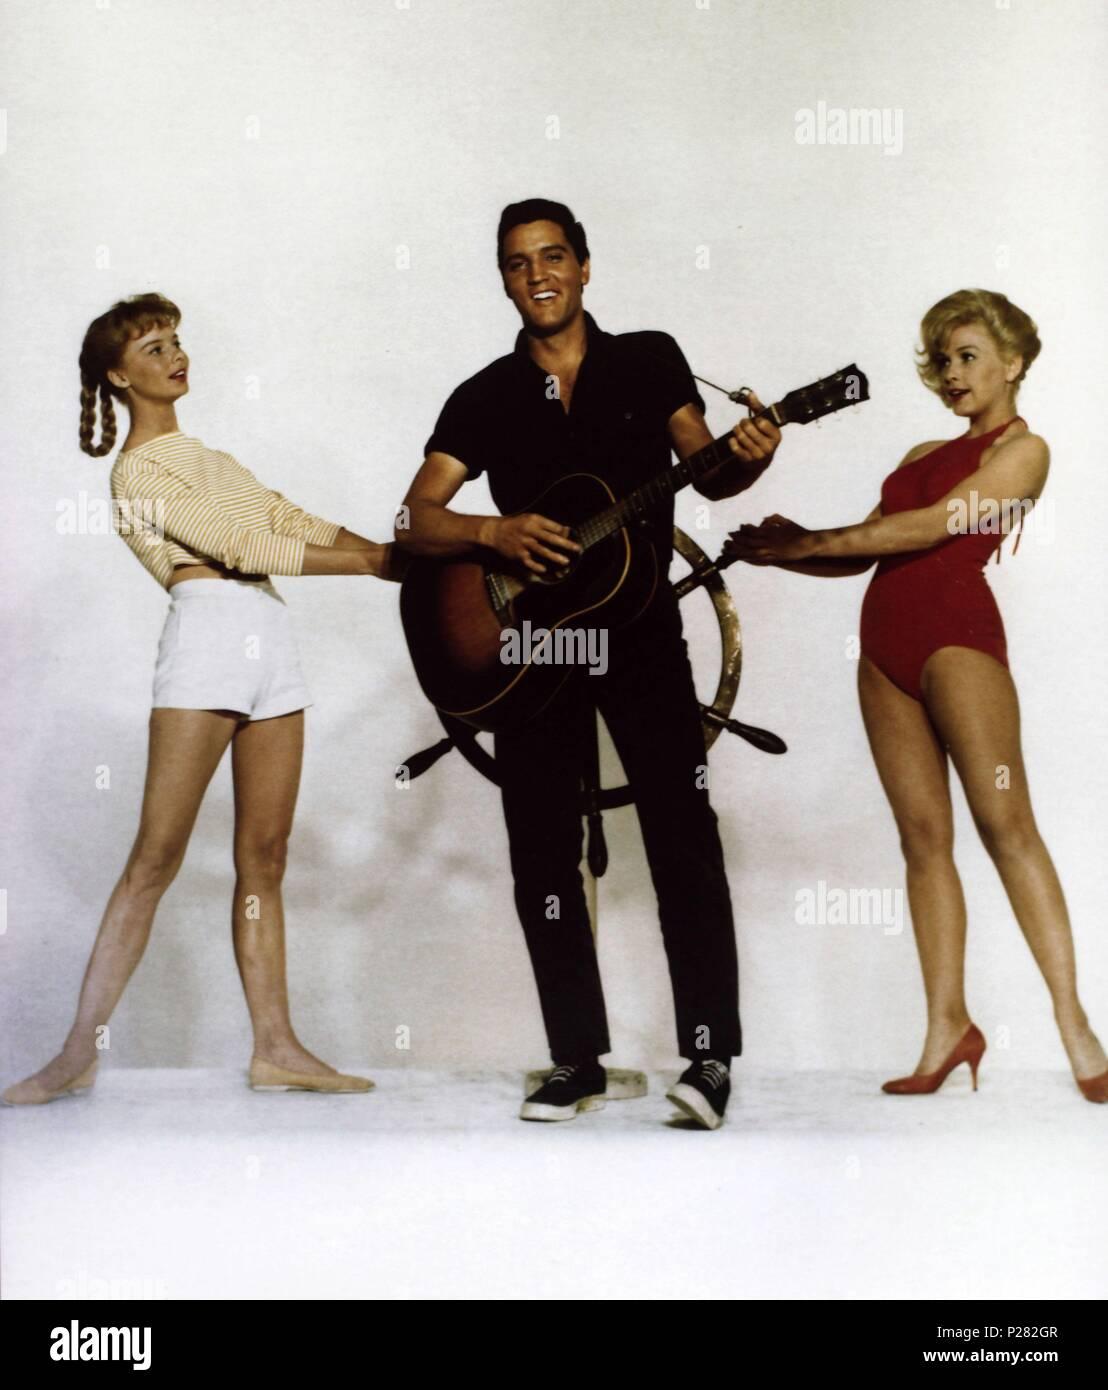 "1962 ELVIS PRESLEY in the Movies Photo /""GIRLS GIRLS GIRLS/"" STUDIO POSE 004"